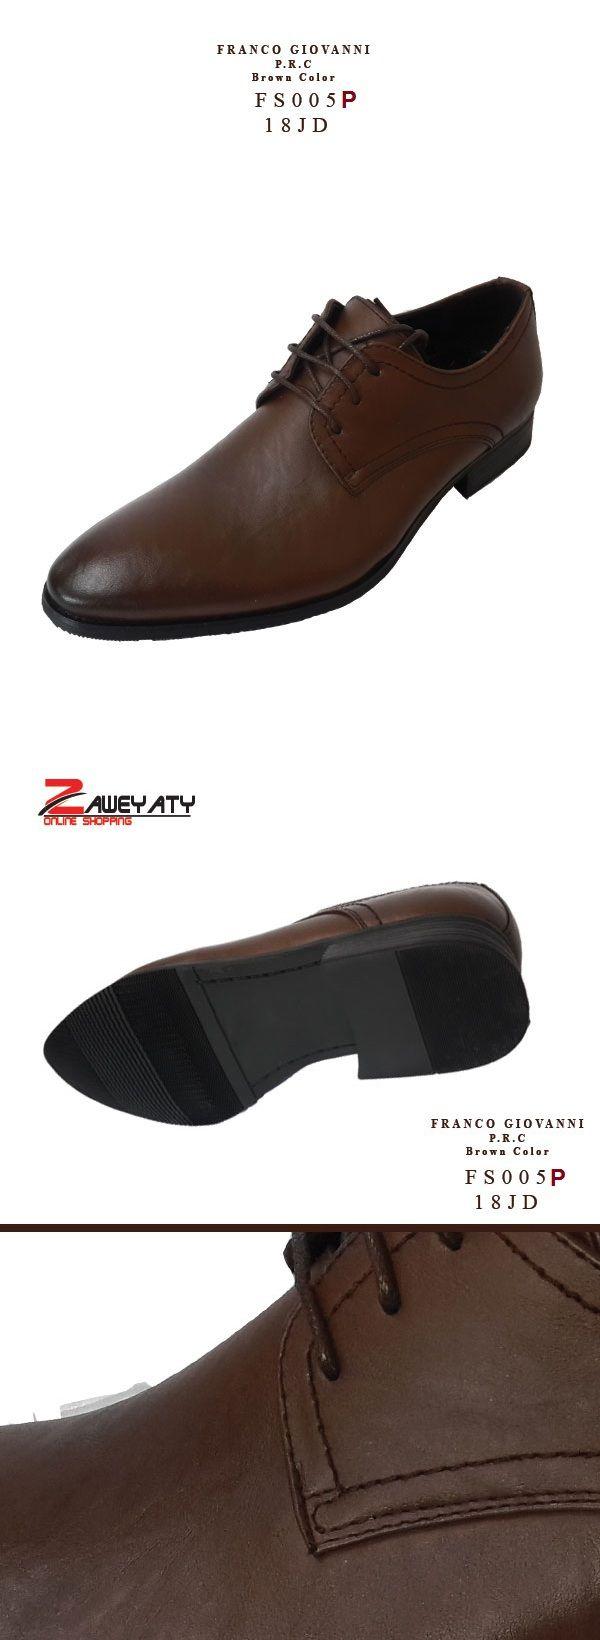 مع رباط حذاء رجالي لون عسلي جلد رسمي Men S Shoes Black Color Online Shopping Zaweyaty Online Shopping زاويتي Dress Shoes Men Loafers Men Dress Shoes